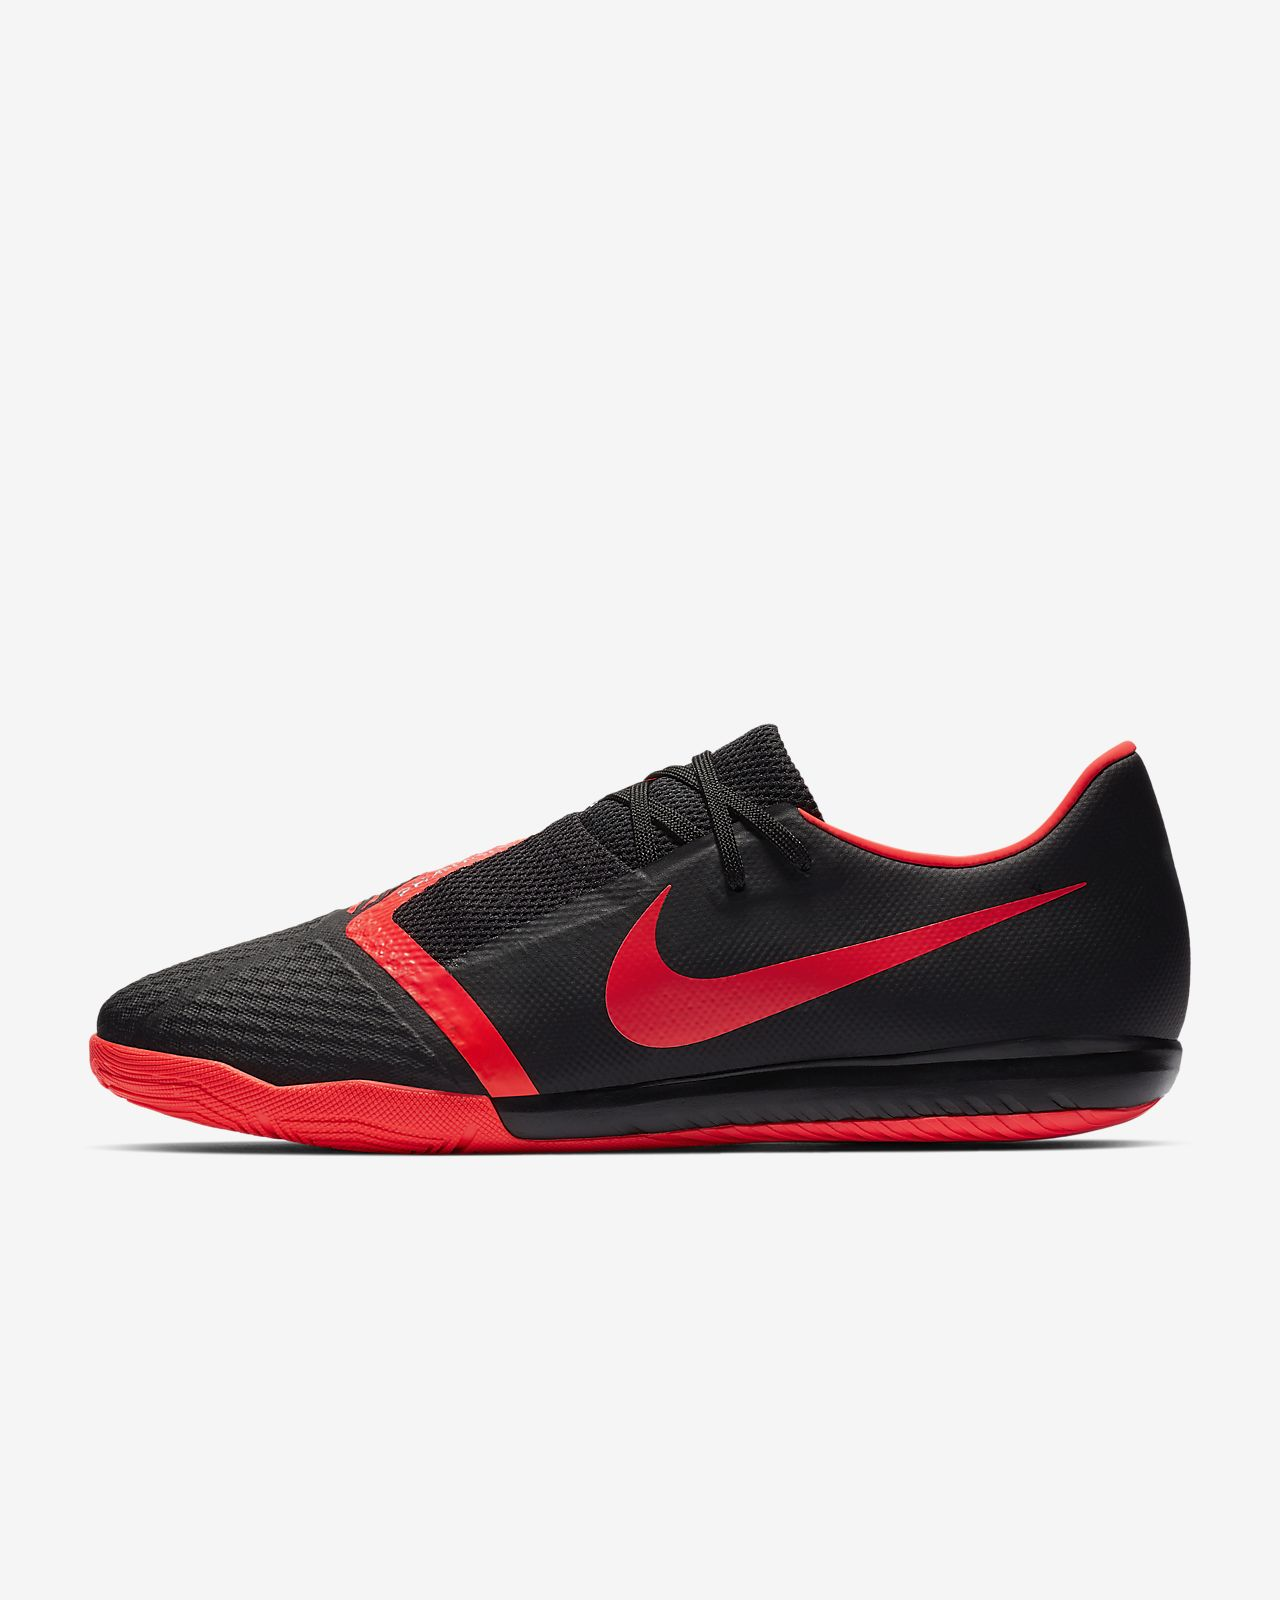 Fotbollssko för inomhusplan Nike Phantom Venom Academy IC